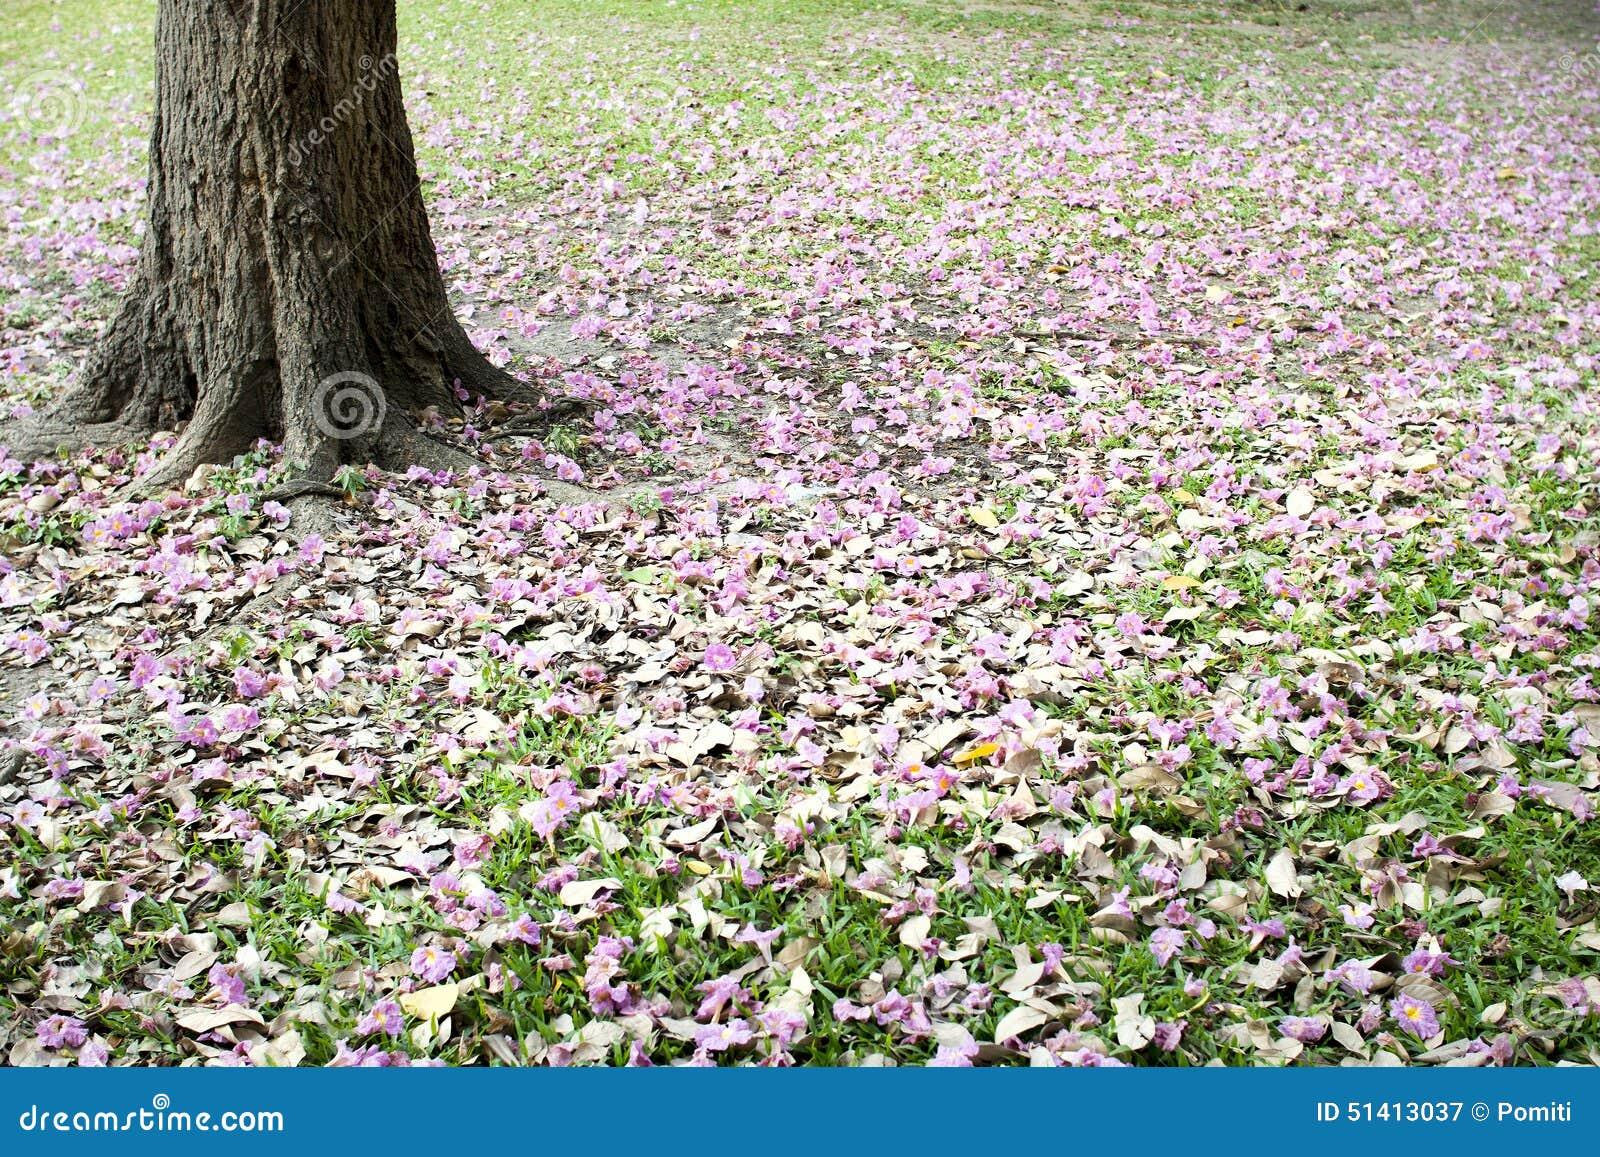 Flowers of pink trumpet tree falling on ground stock image image flowers of pink trumpet tree falling on ground mightylinksfo